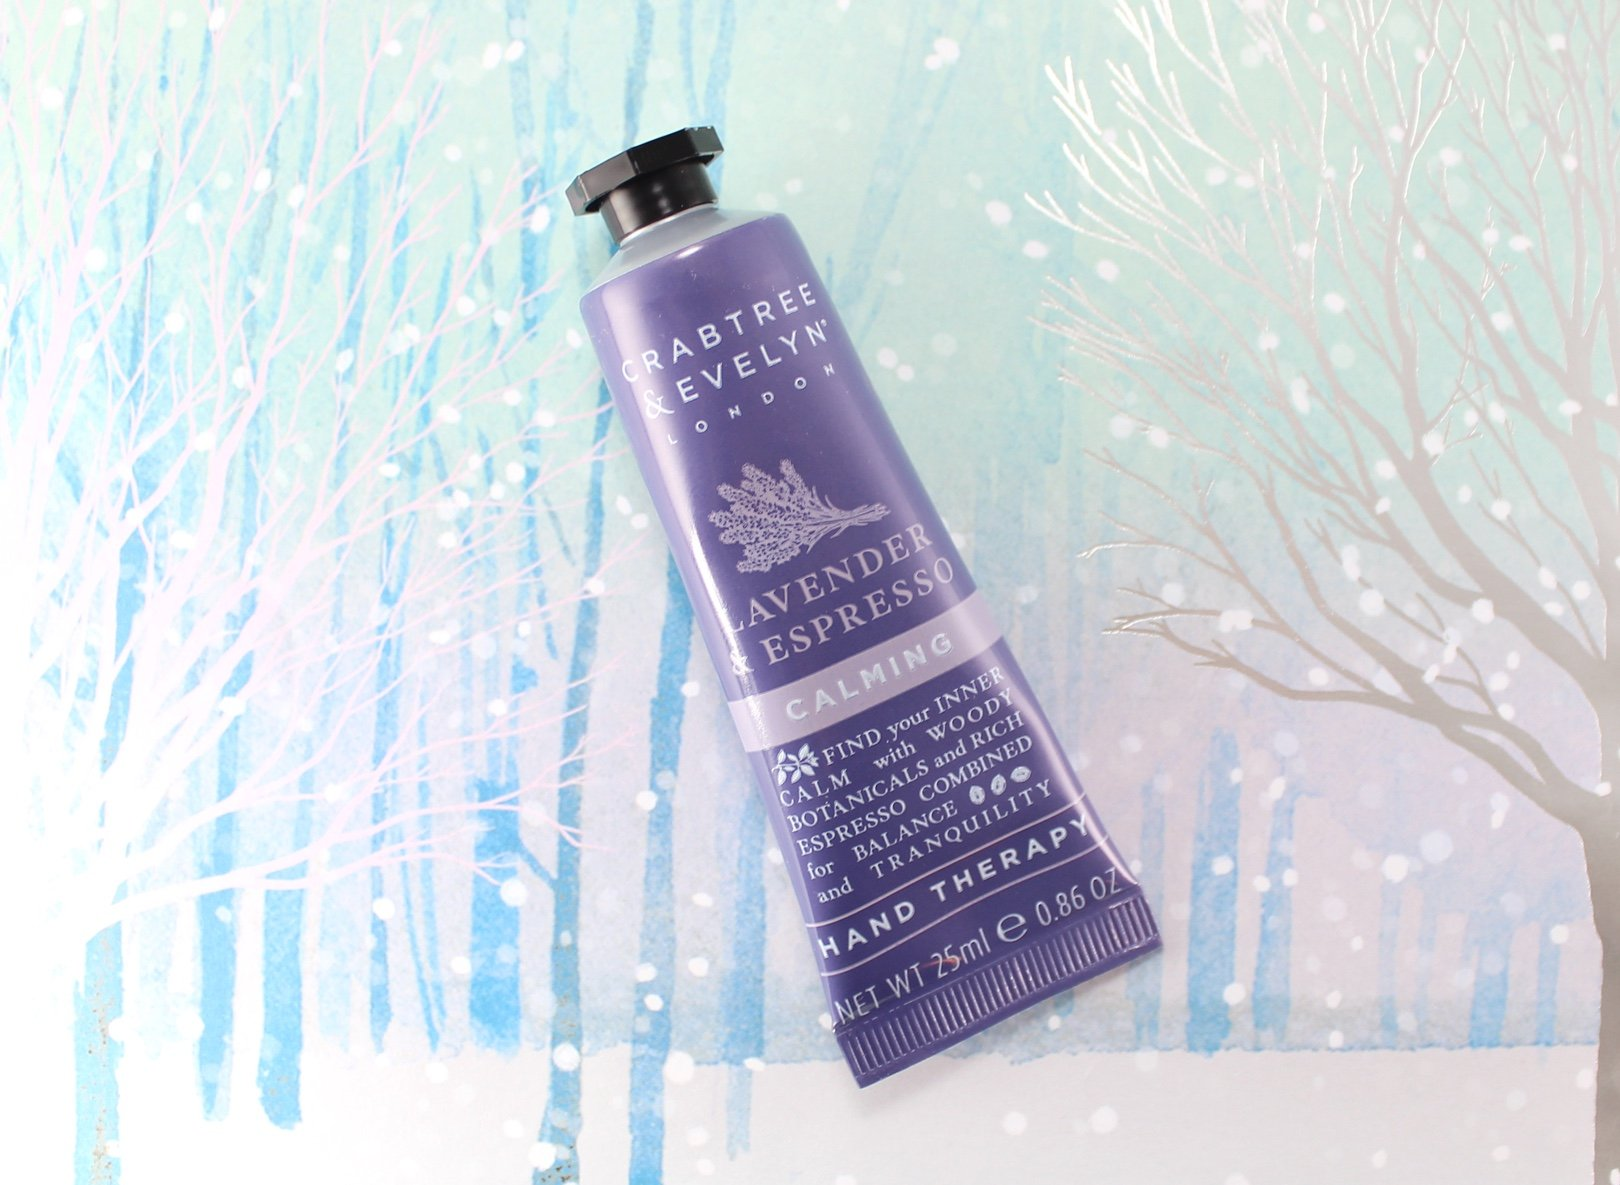 12 days of crabtree & evelyn advent calendar – day 9 lavender espresso